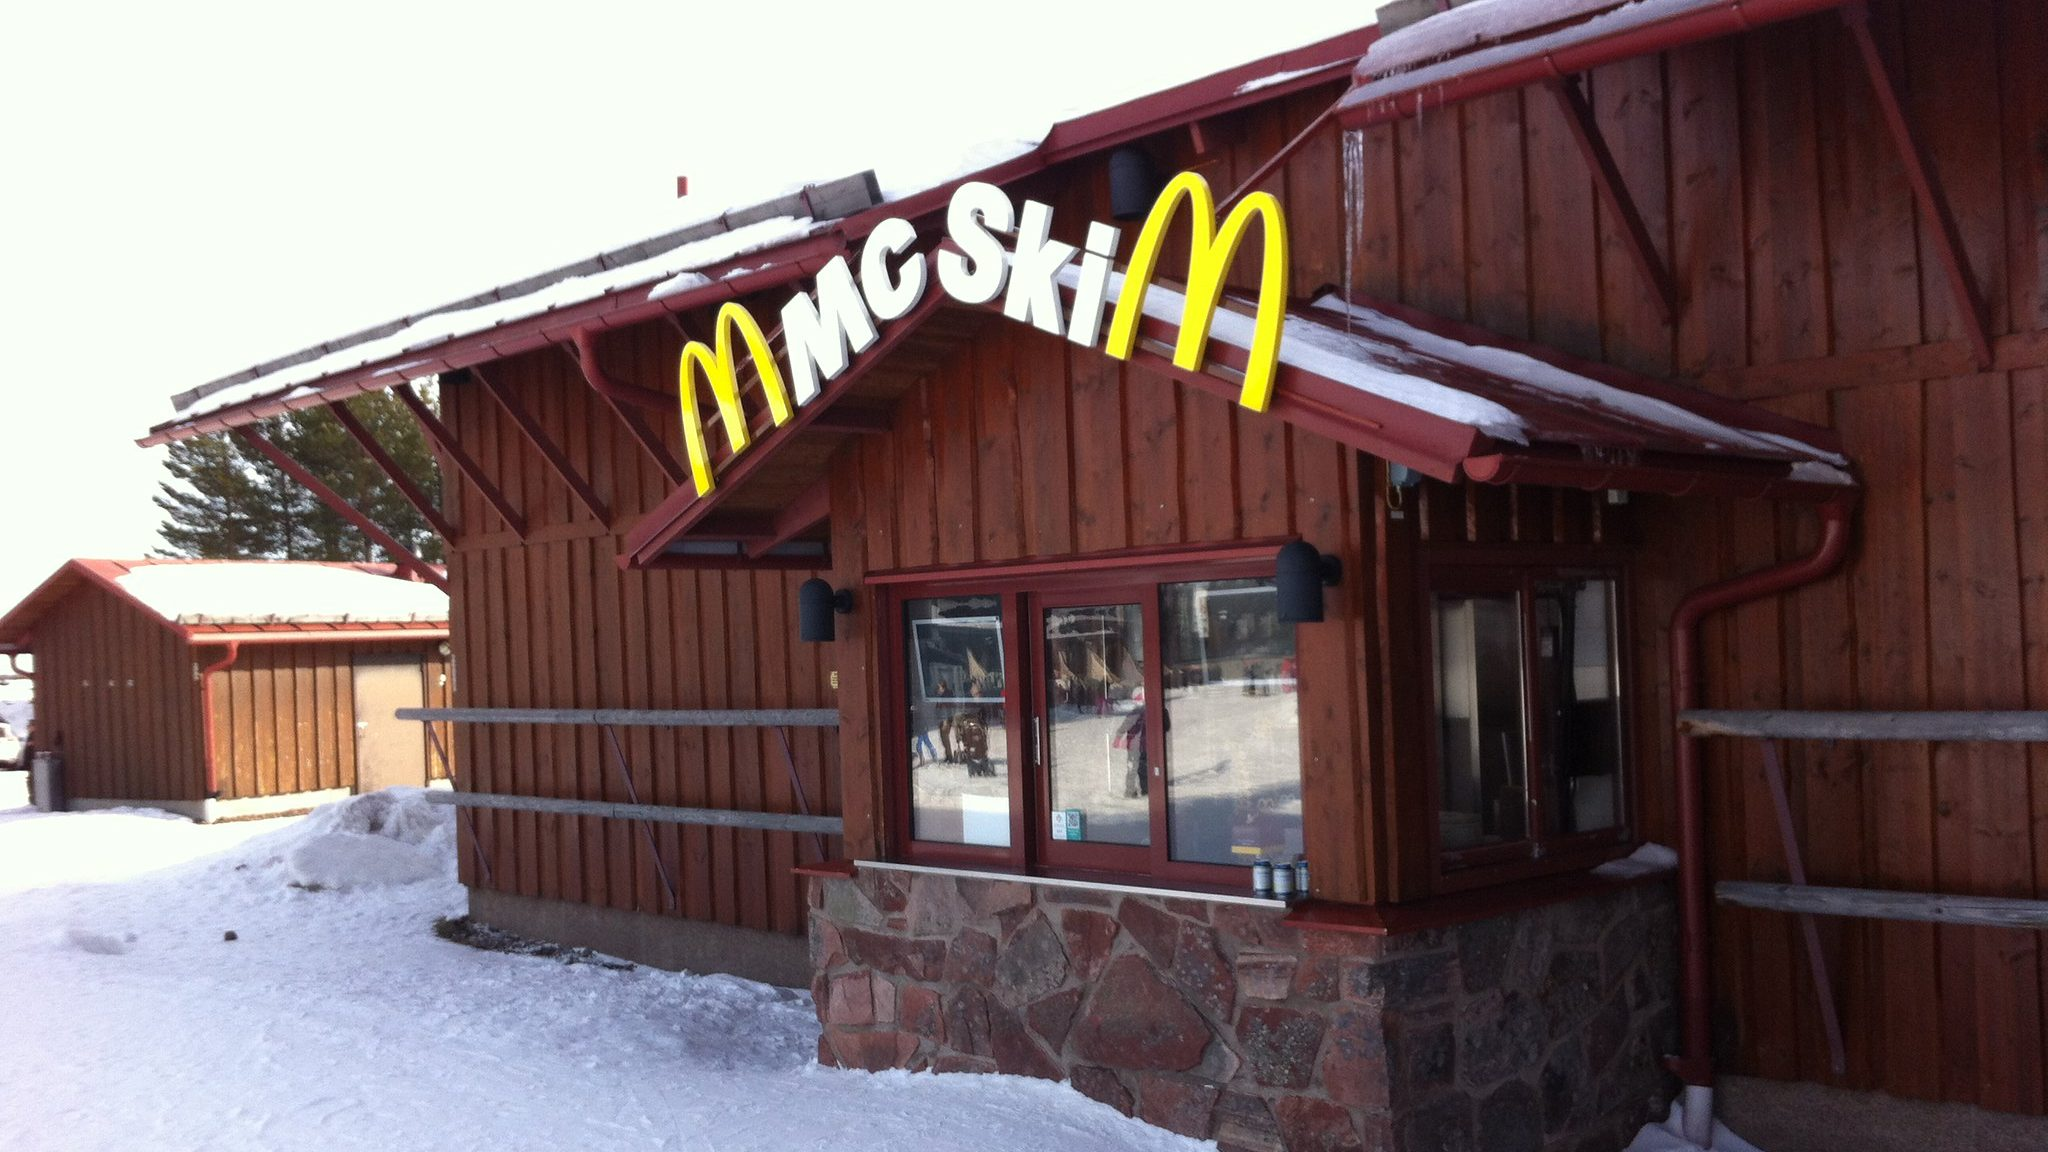 McSki McDonald's in Lindvallen, Sweden